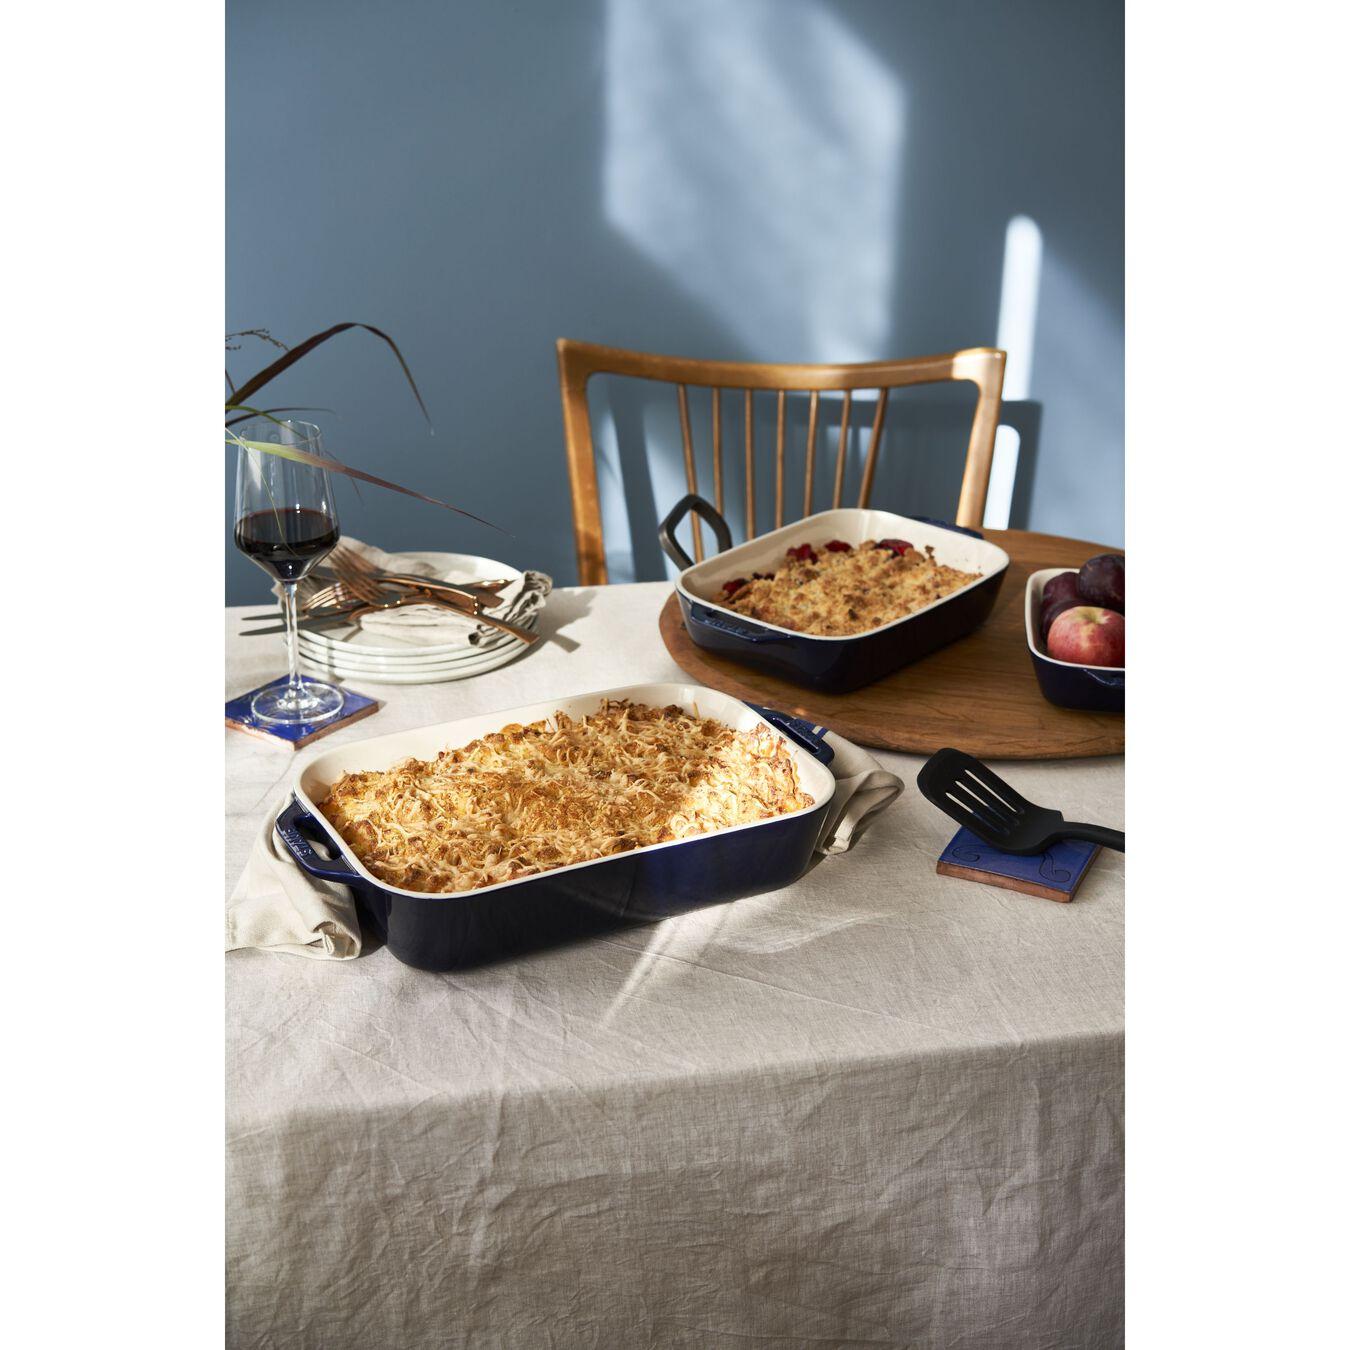 13-inch x 9-inch Rectangular Baking Dish - Dark Blue,,large 4